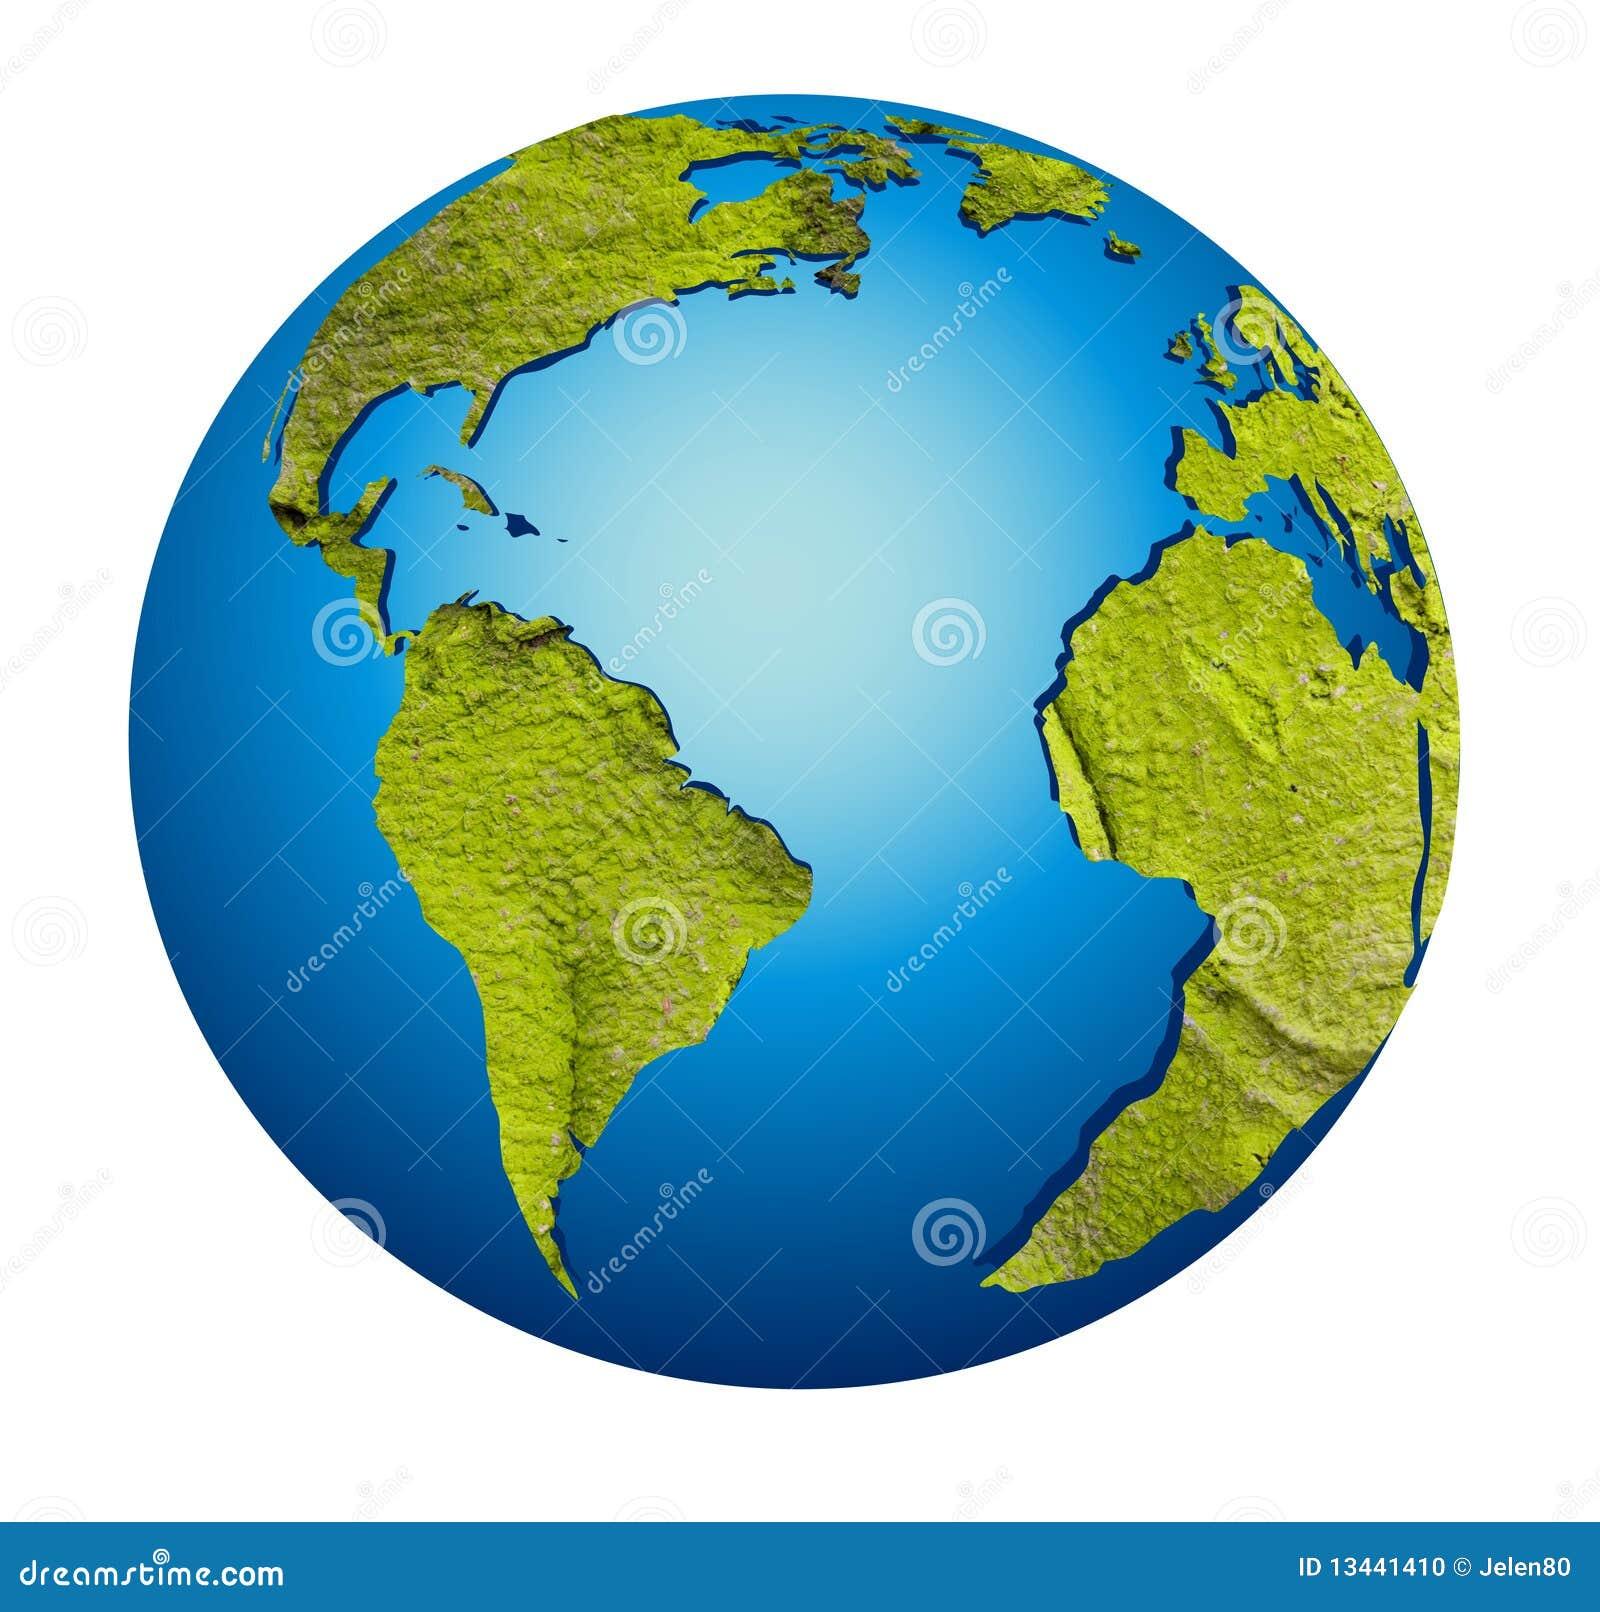 Model Of Earth Globe Stock Photo